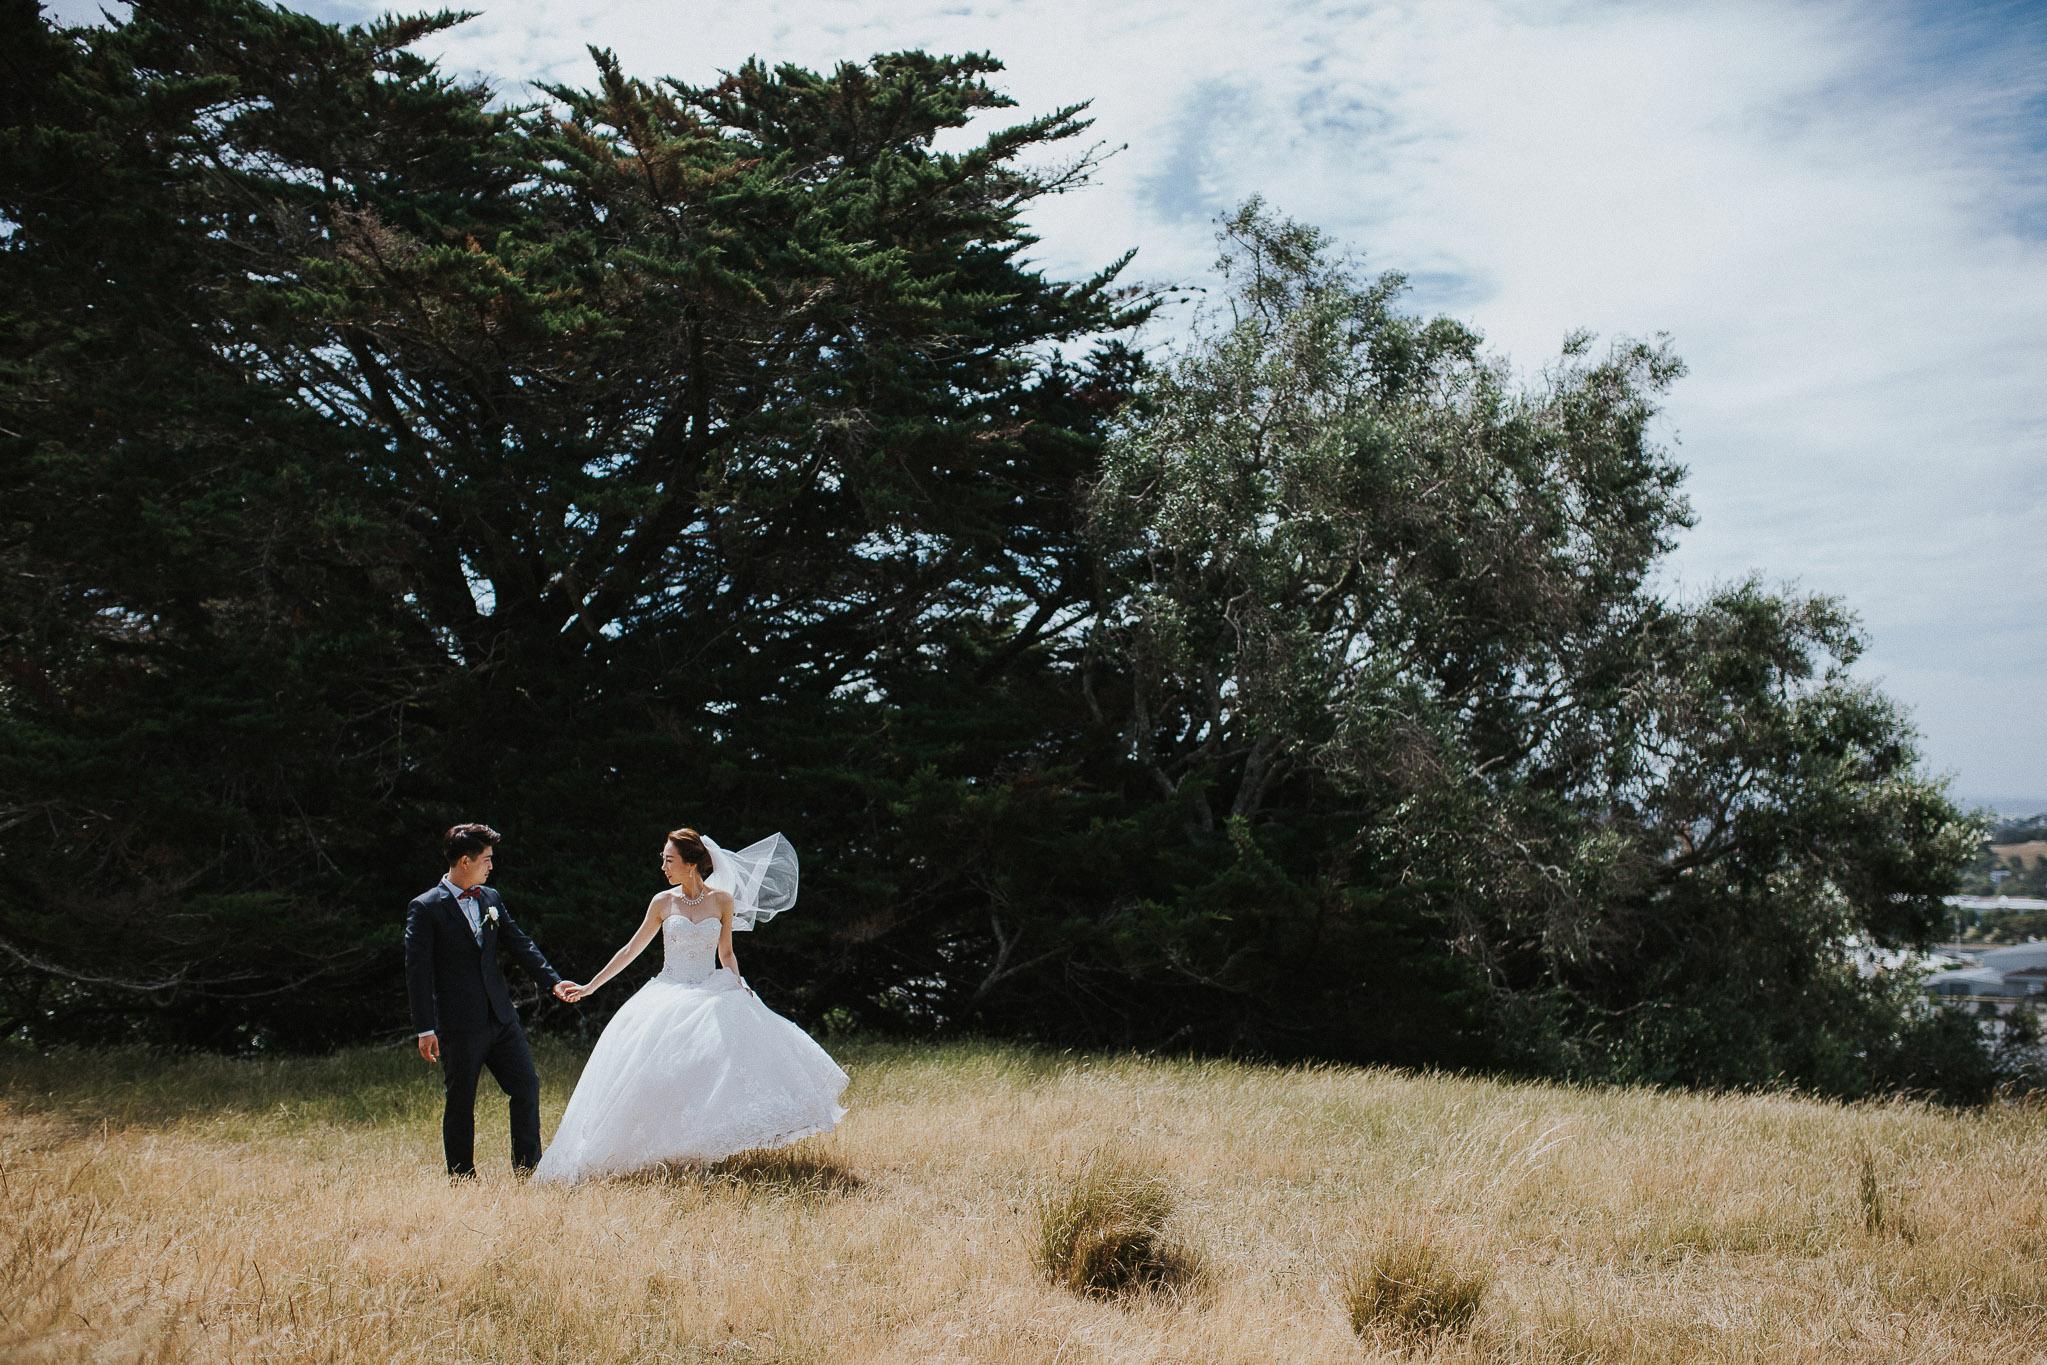 Mantells Auckland wedding photographer - Eri-Jun-51.jpg